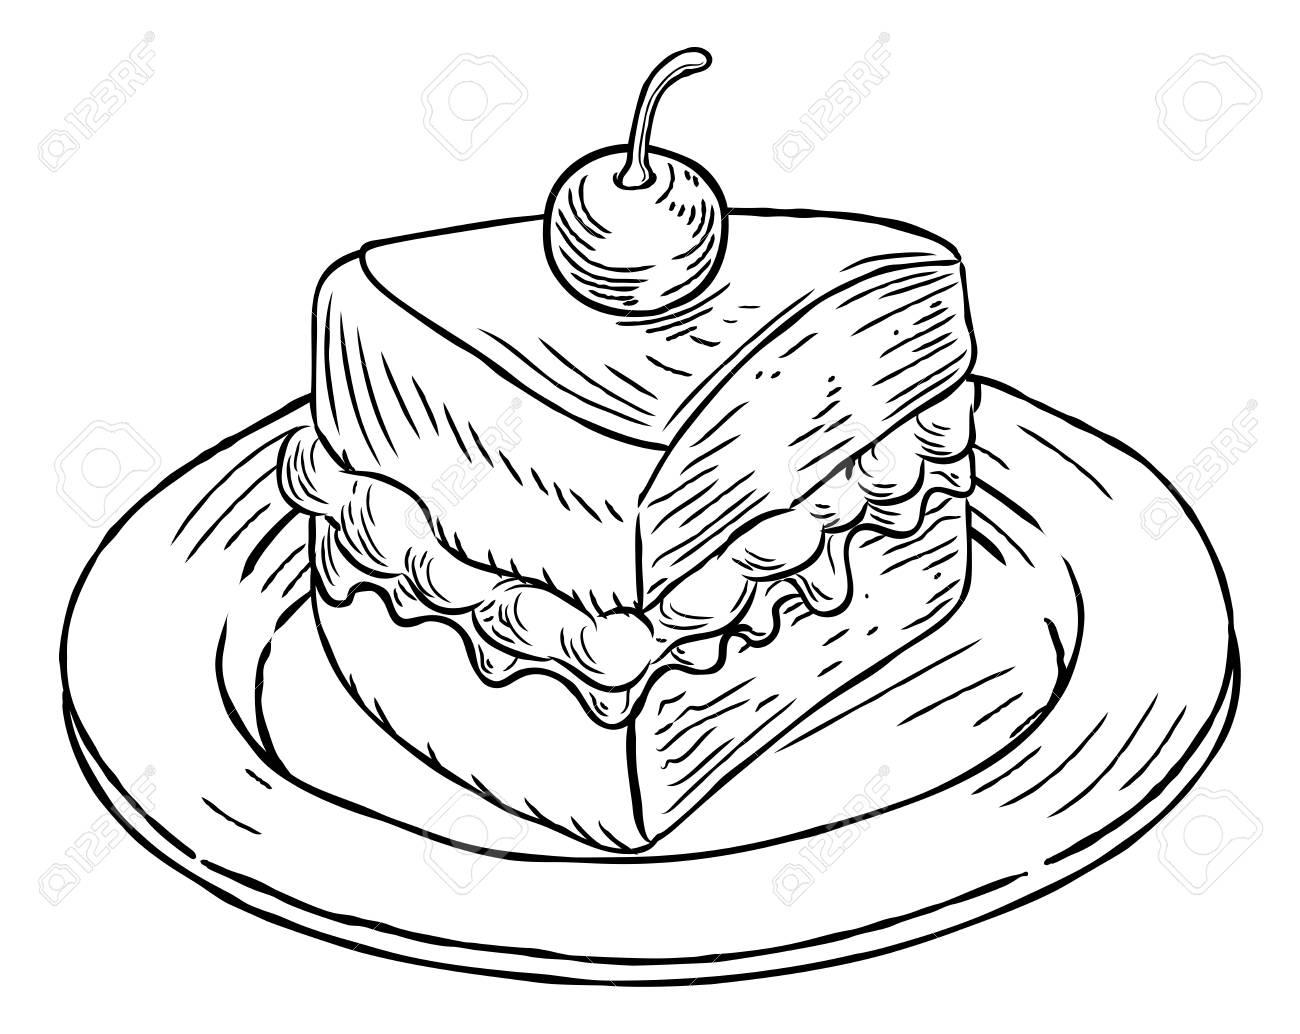 1300x1034 Cake Slice Vintage Retro Woodcut Style Stock Photo, Picture